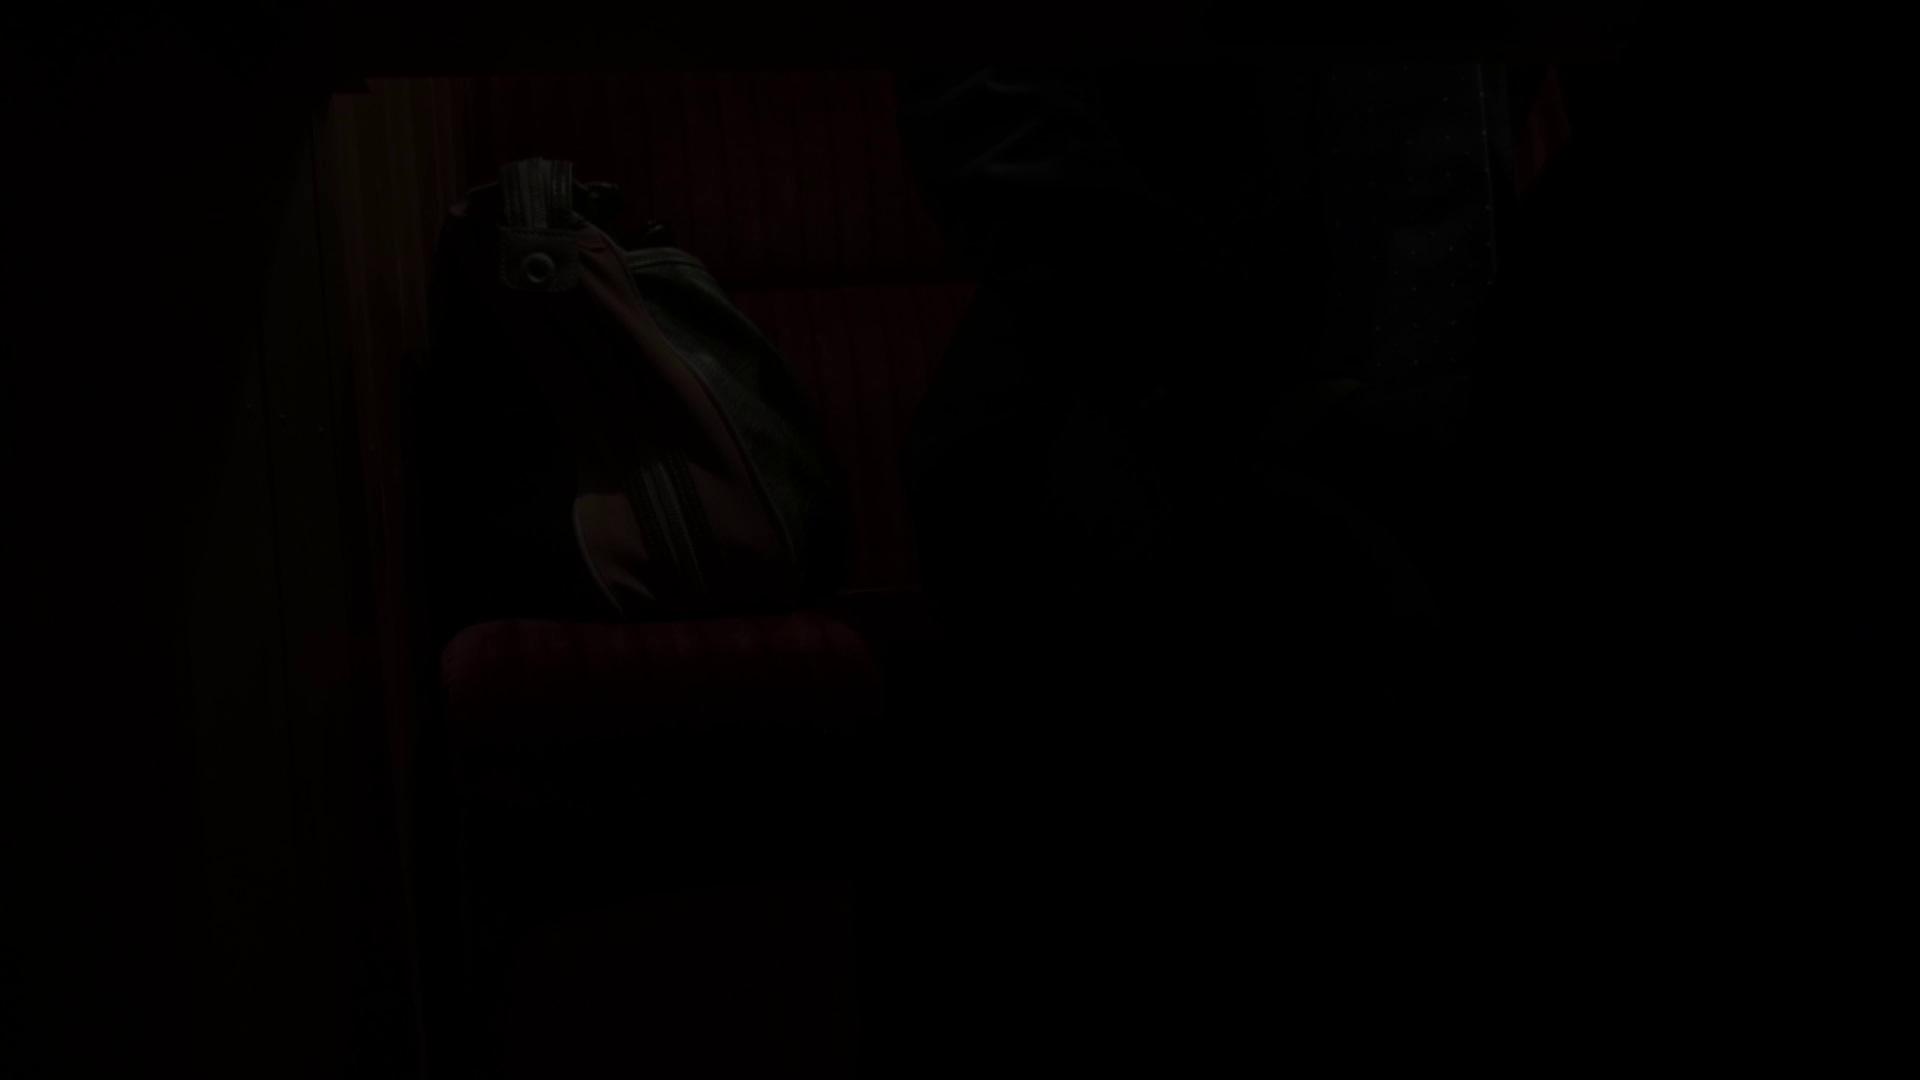 episode1 ヒロトさんと保険外交員との顔合わせ 盗撮エロすぎ   熟女  51連発 37